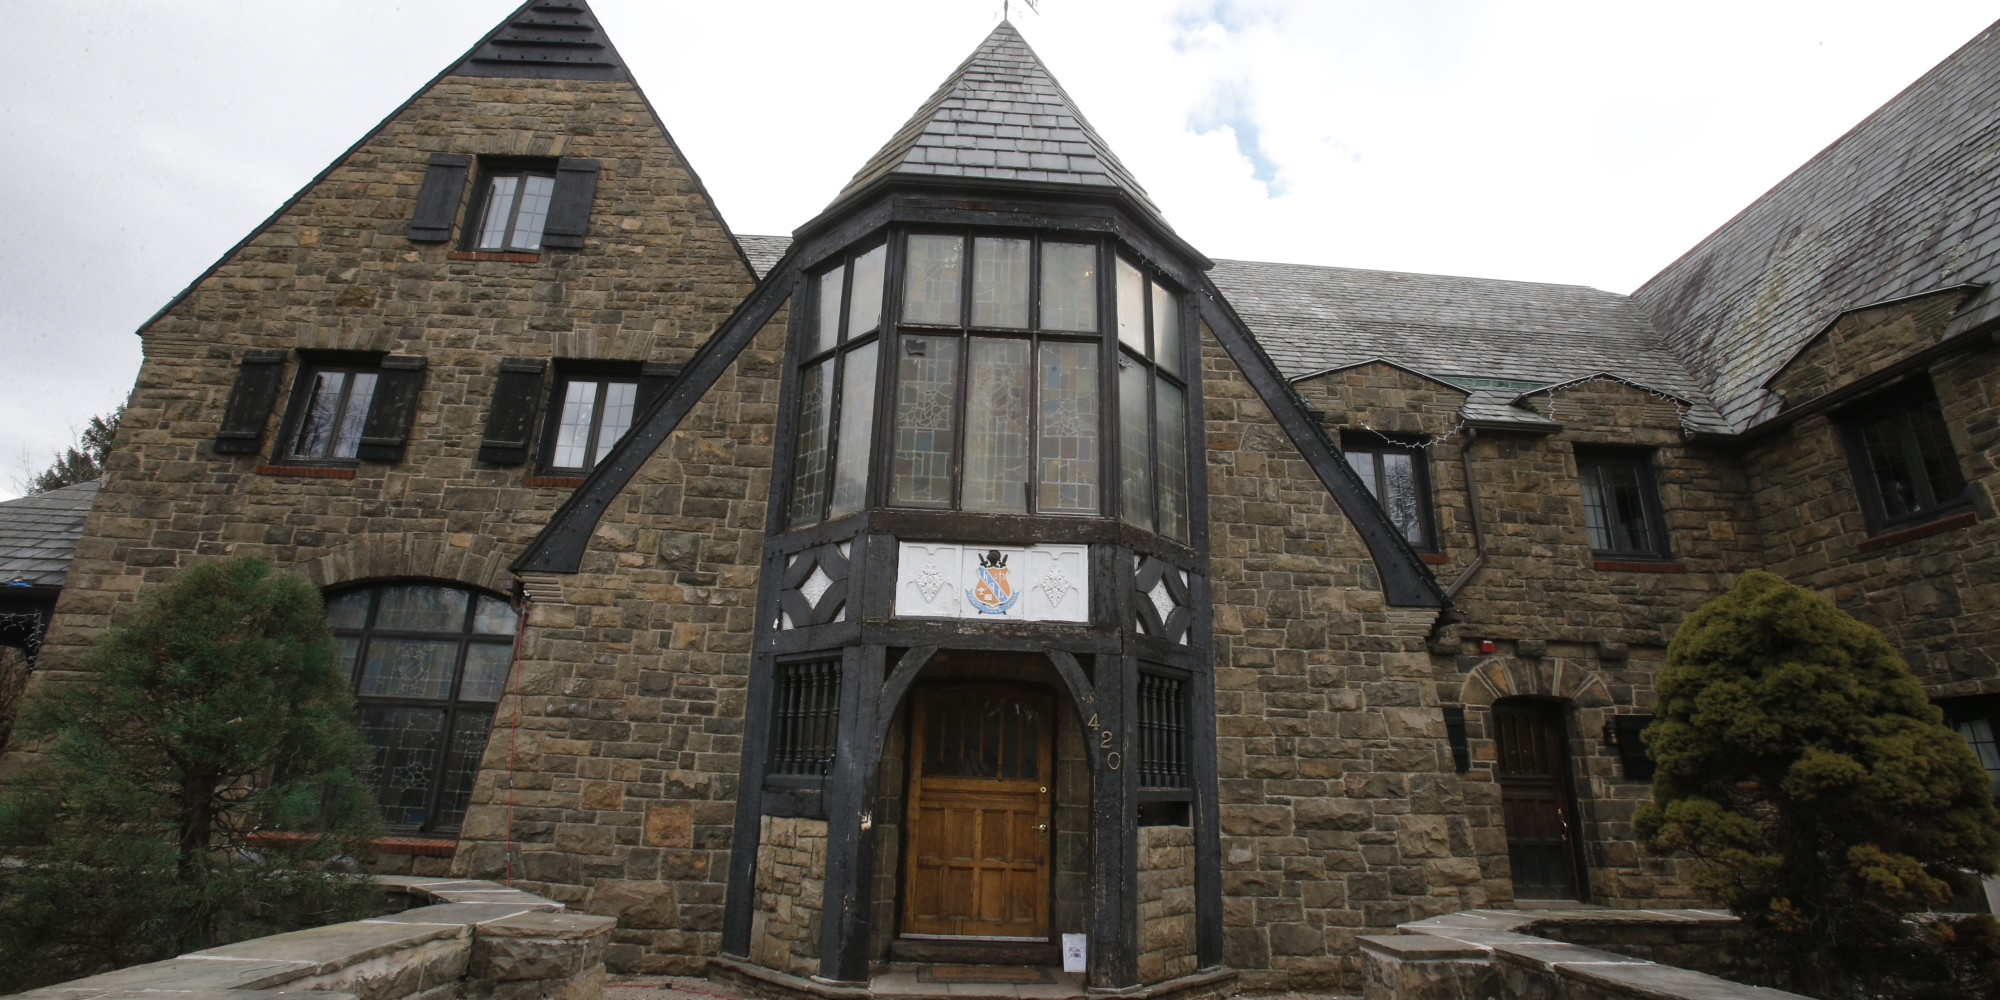 Kappa Delta Rho Fraternity Expels 38 Penn State Members As ...